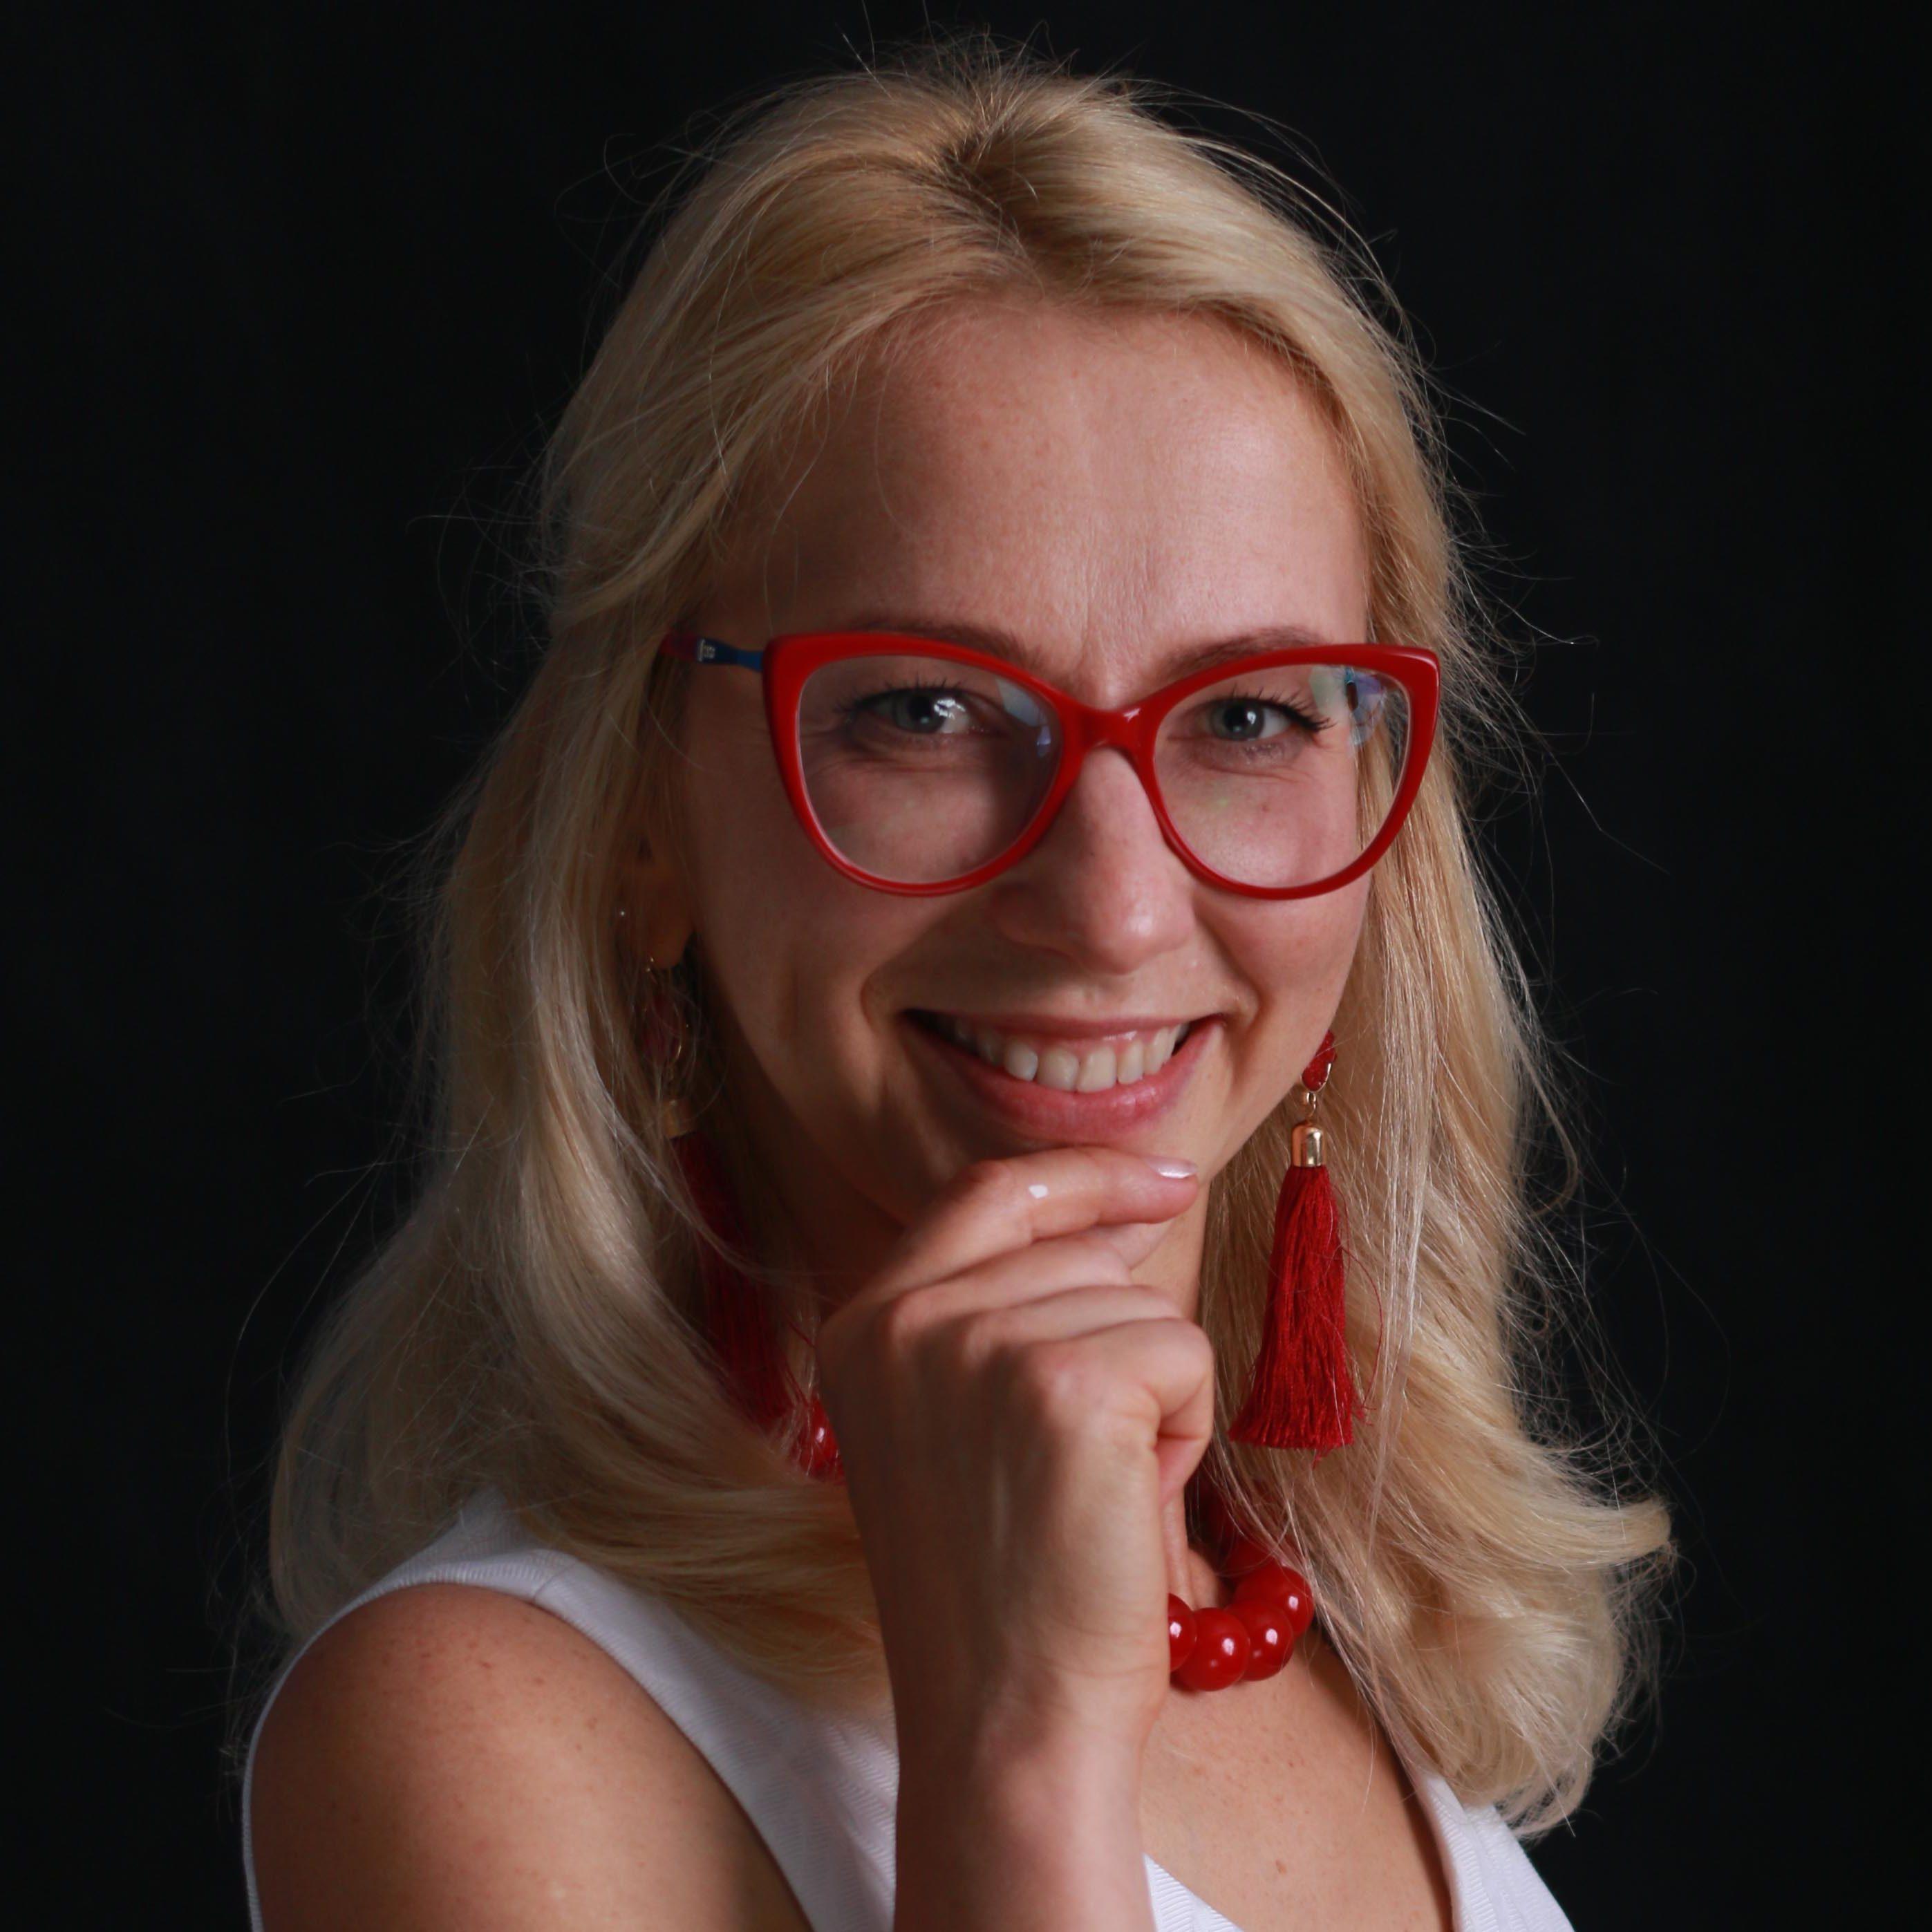 izabella murawska